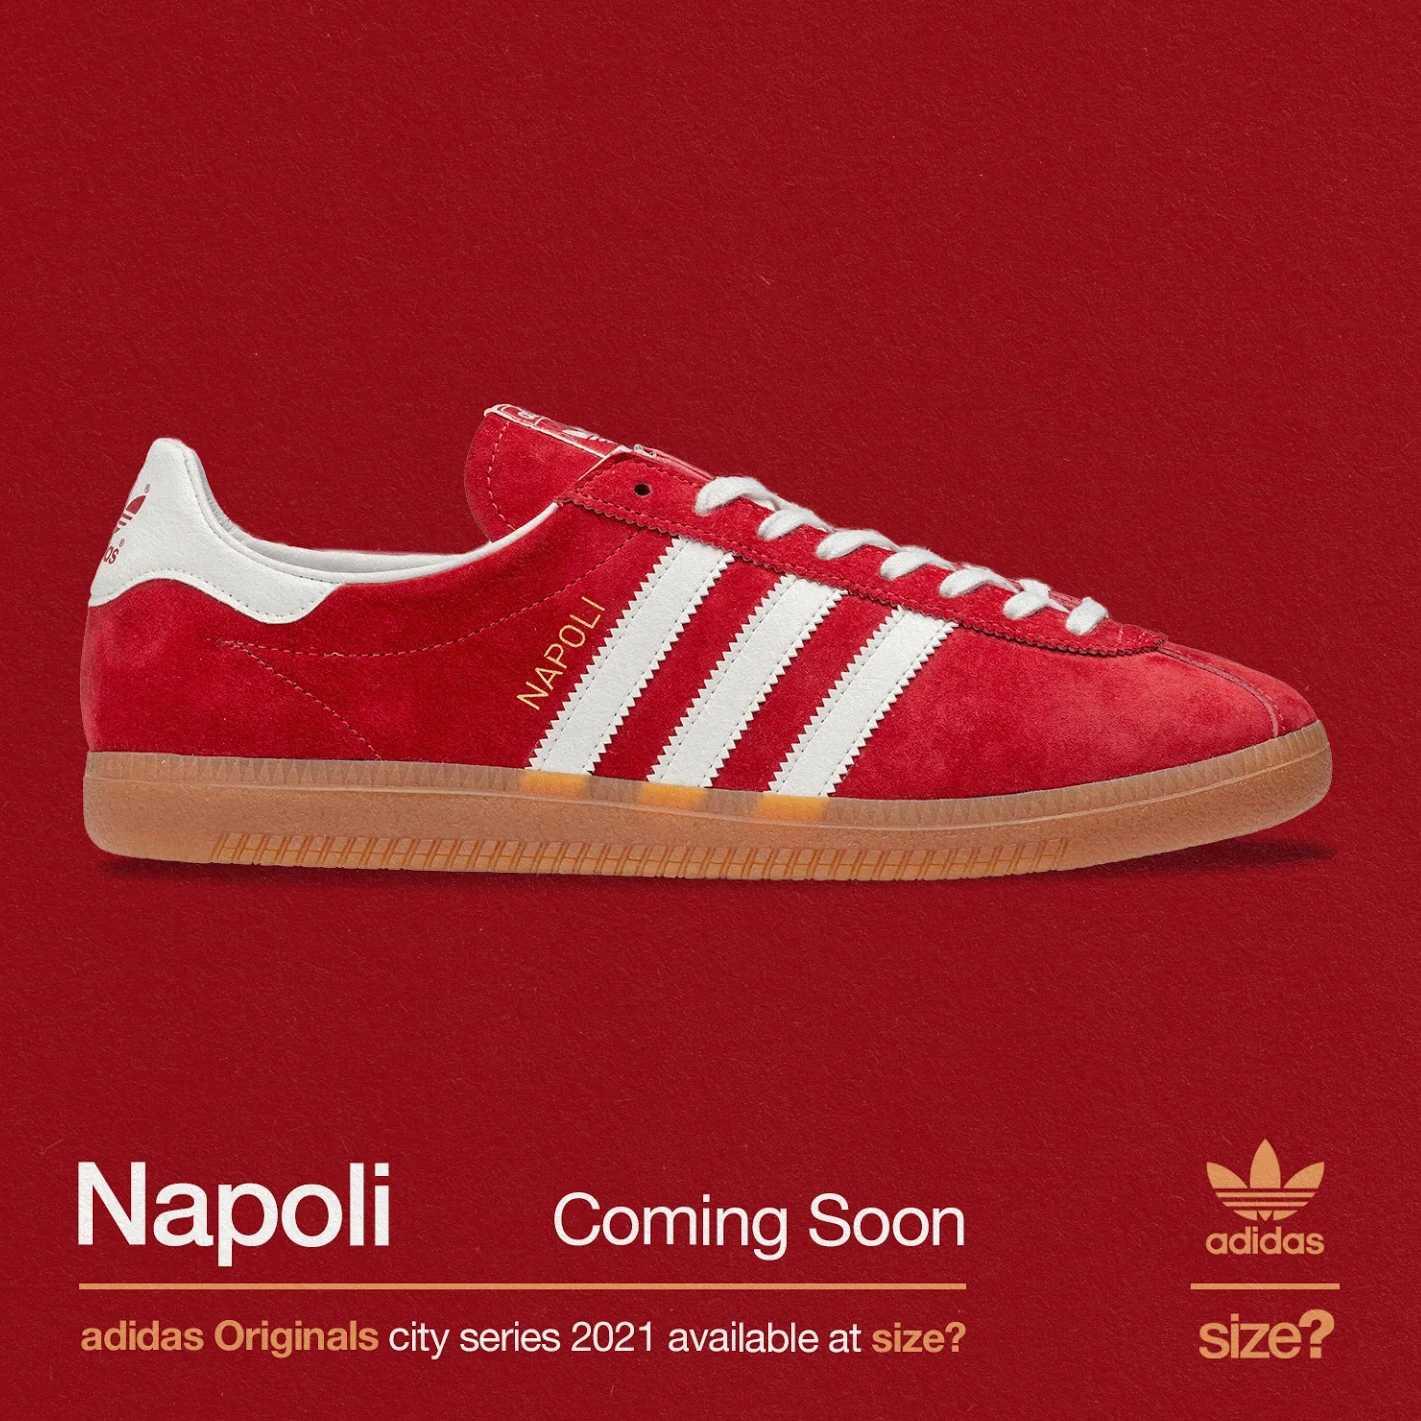 NAPOLI (Size? Exclusive)